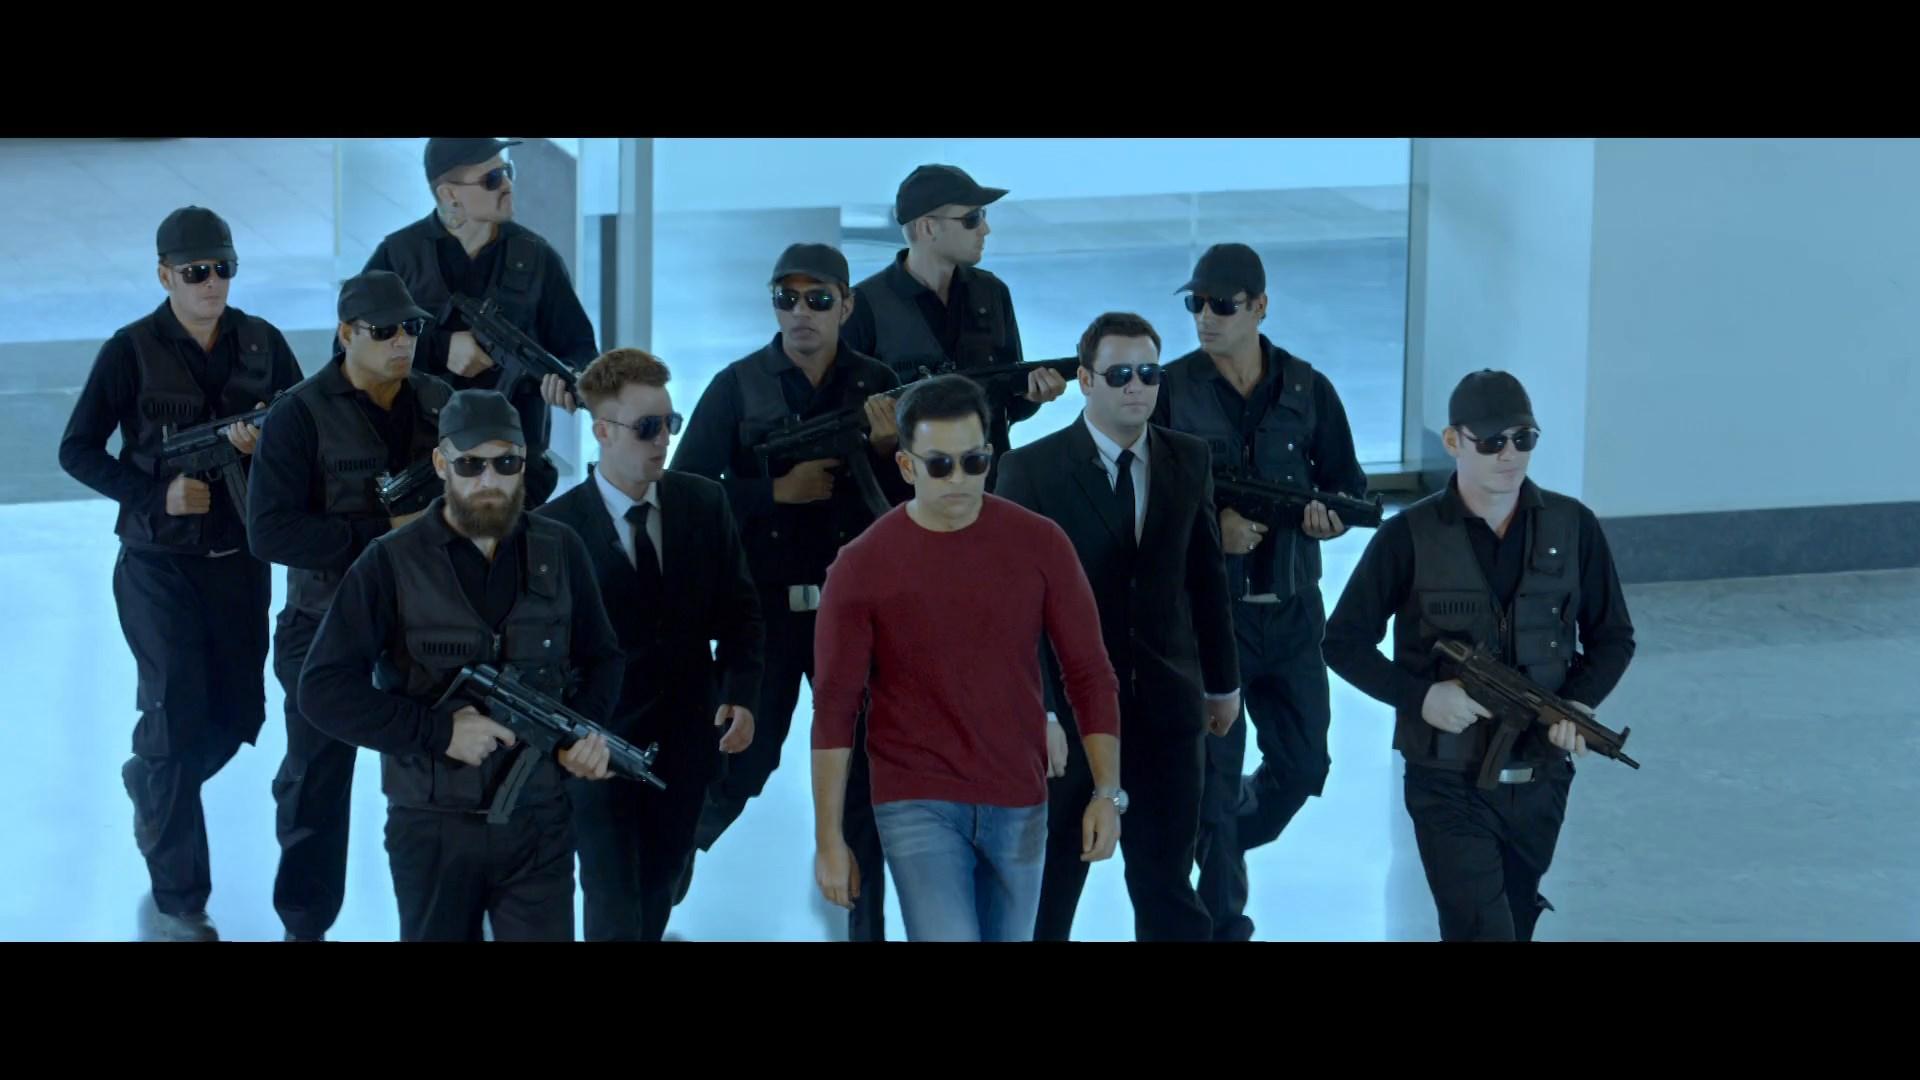 Espia por Venganza (2017) 1080p WEB-DL Latino